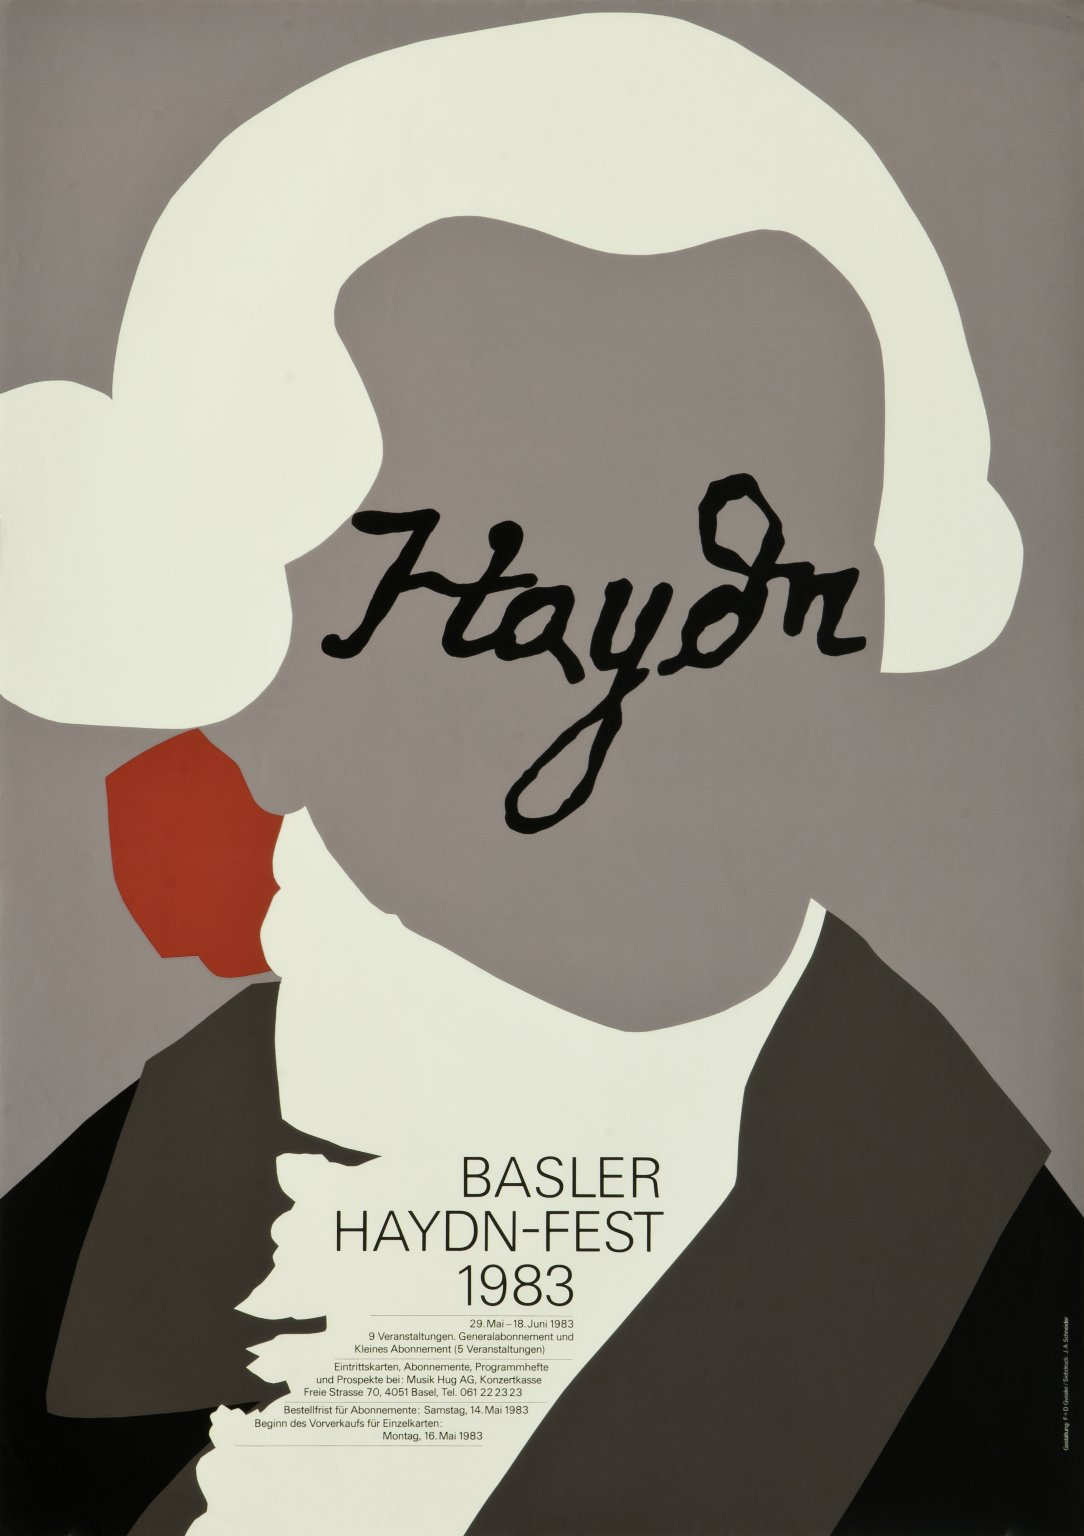 Basler Haydn-Fest